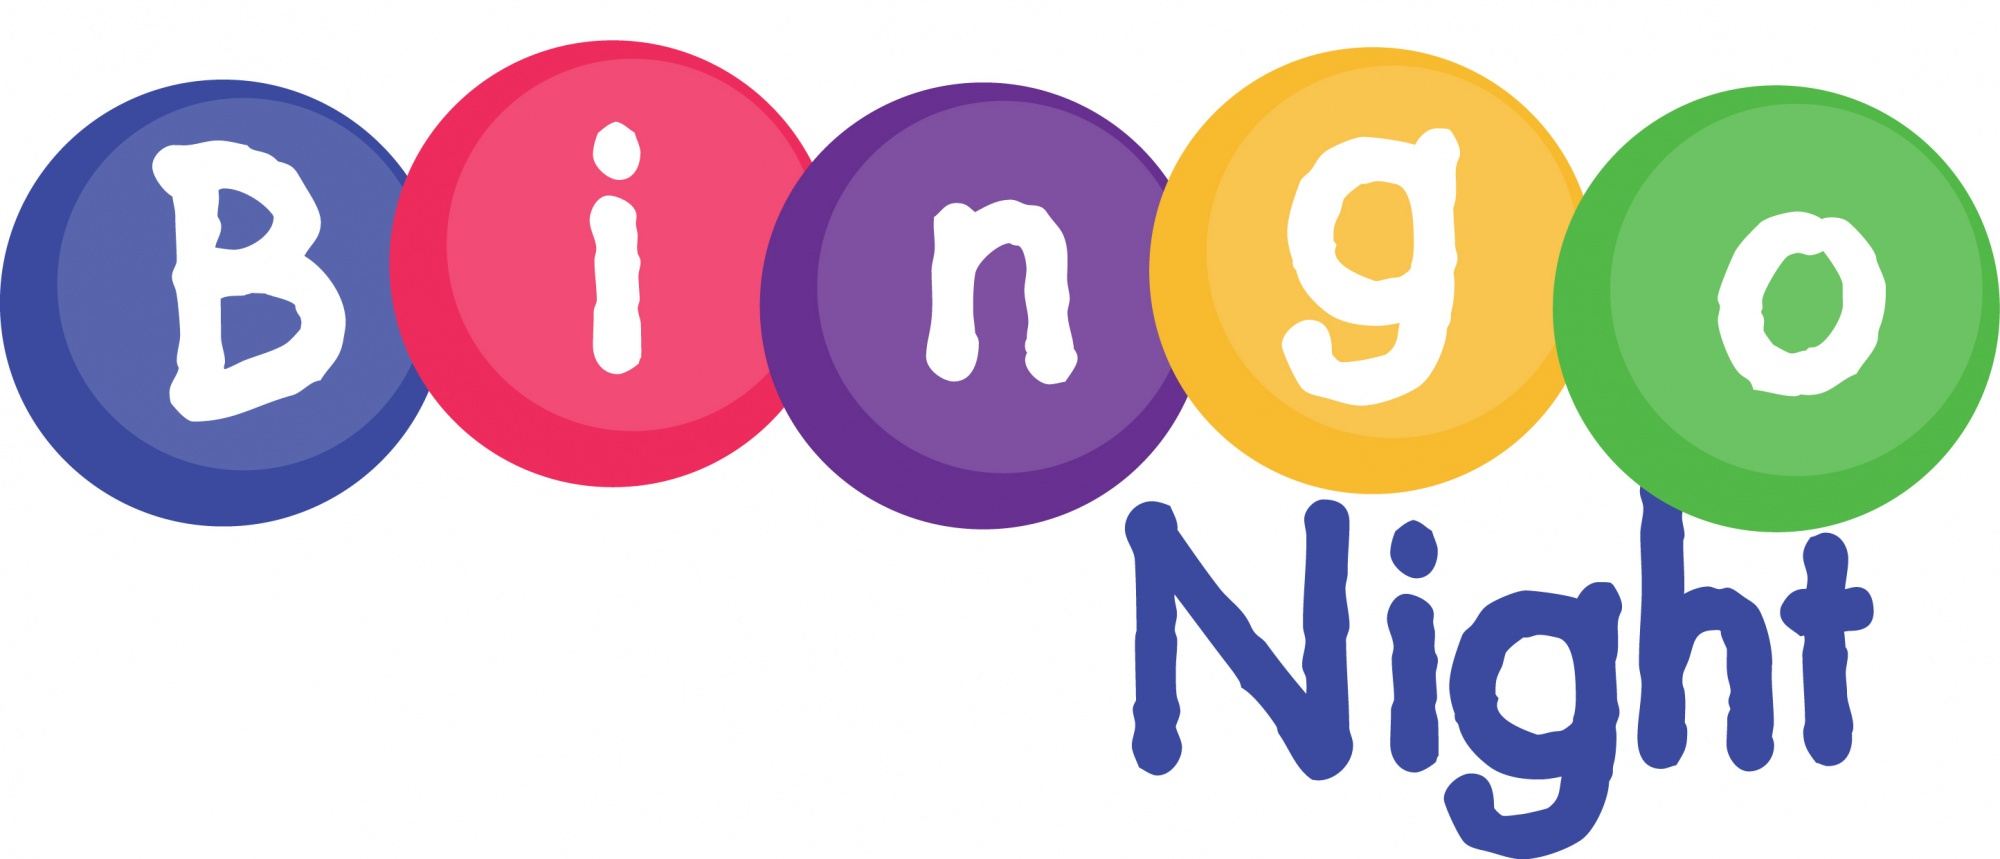 Image result for Bingo night